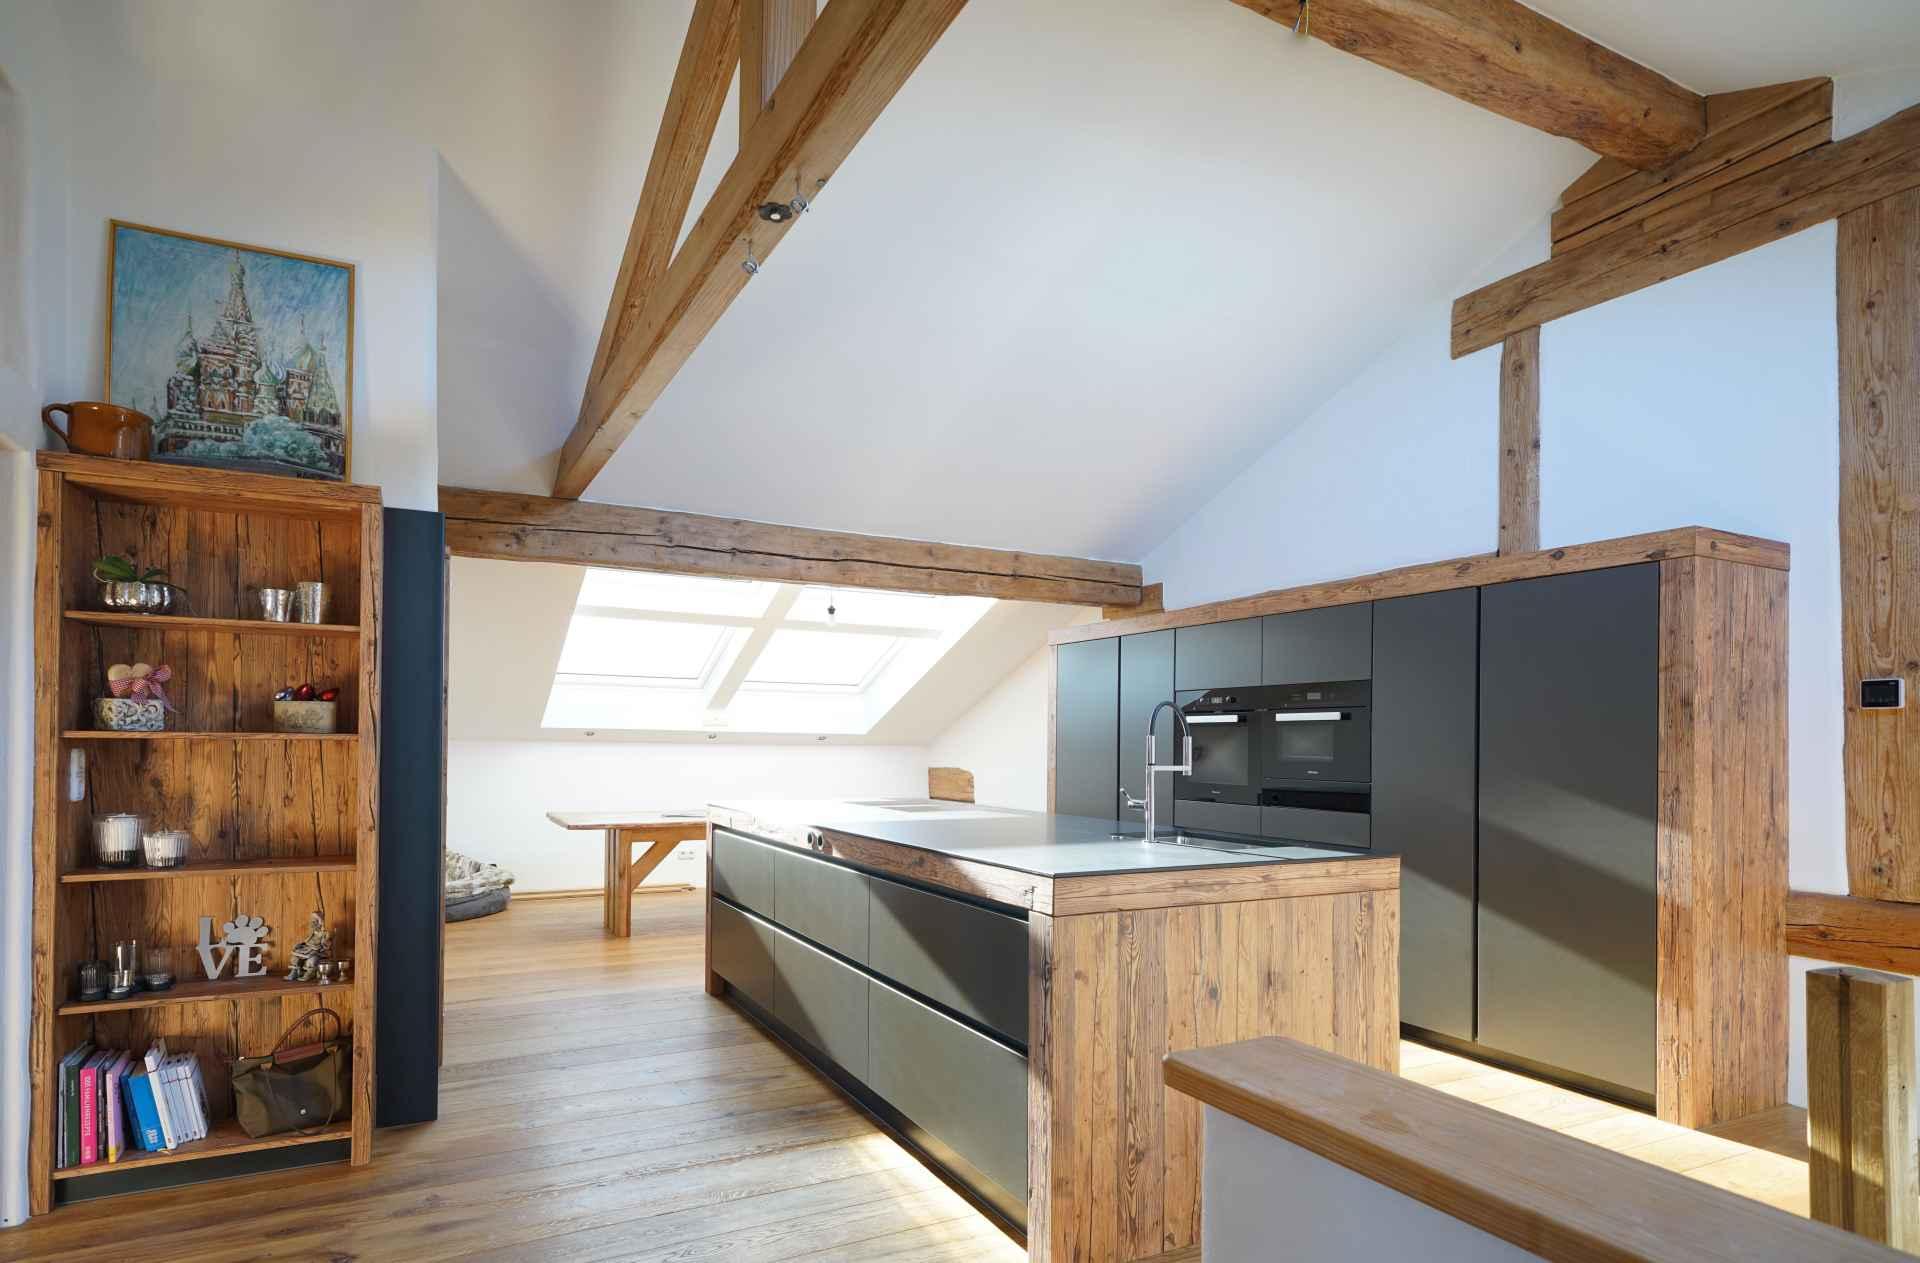 Sendlhofer Küche anthrazit mit Altholz